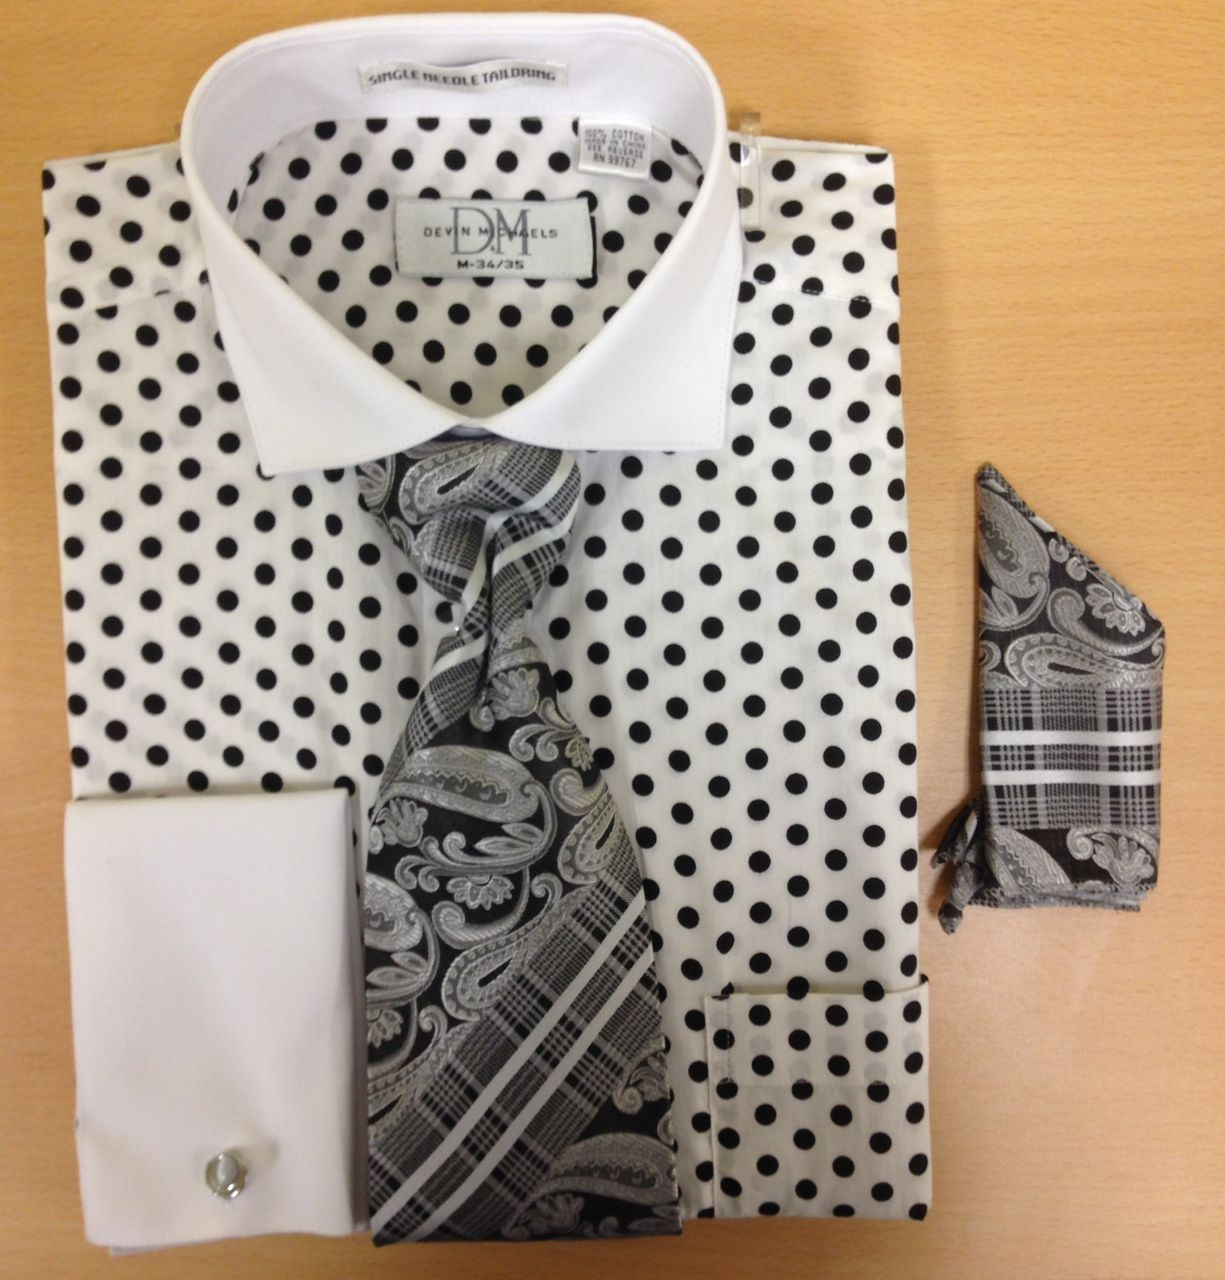 Men's Fashion Polka Dot Pattern Cufflink Dress Shirt Set - White and Black